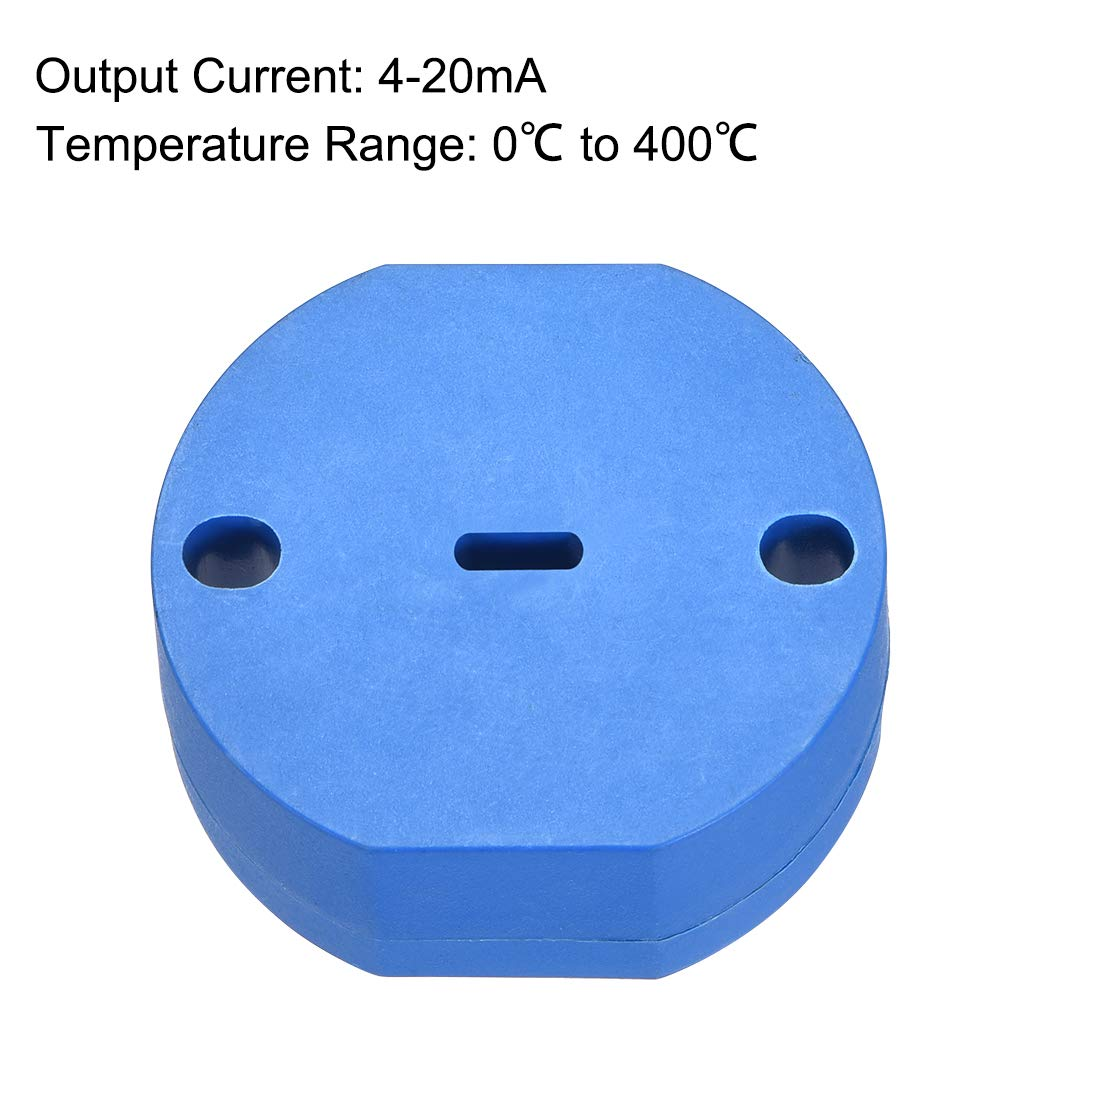 uxcell PT100 Temperature Sensor Transmitter 24V DC 4-20mA 0℃ to 400℃